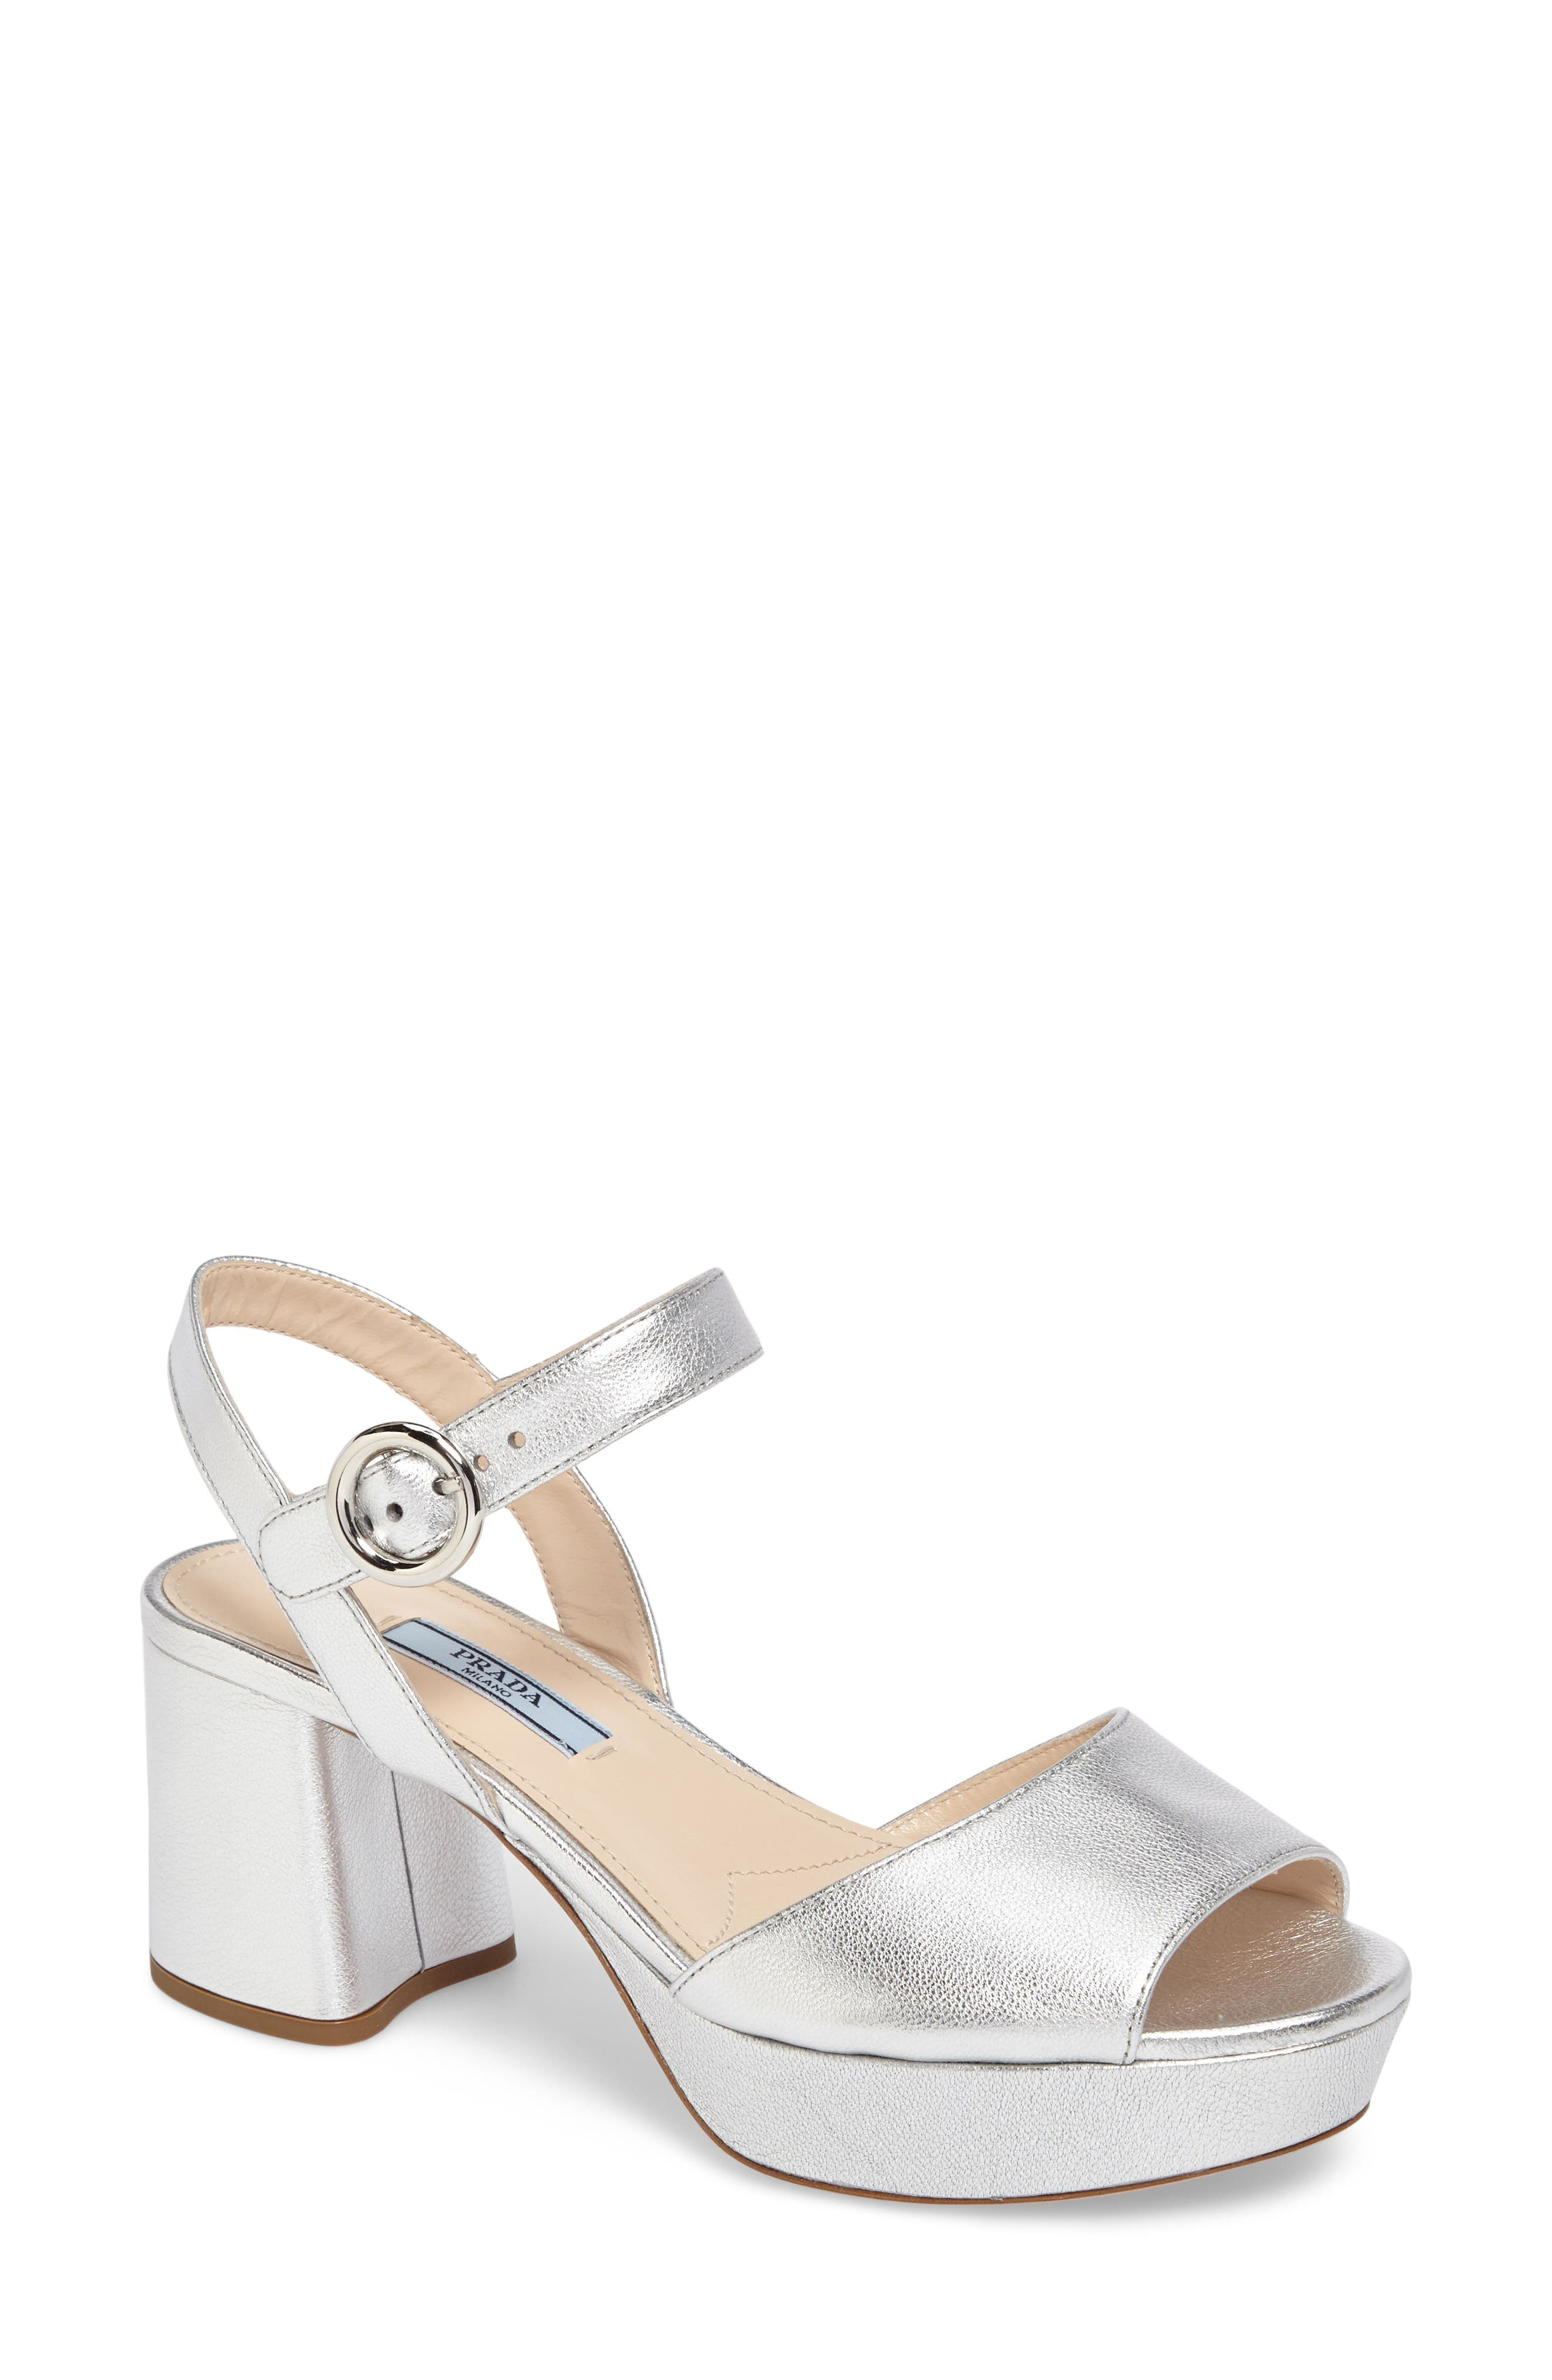 Ankle Strap Platform Sandal,                         Main,                         color, Silver